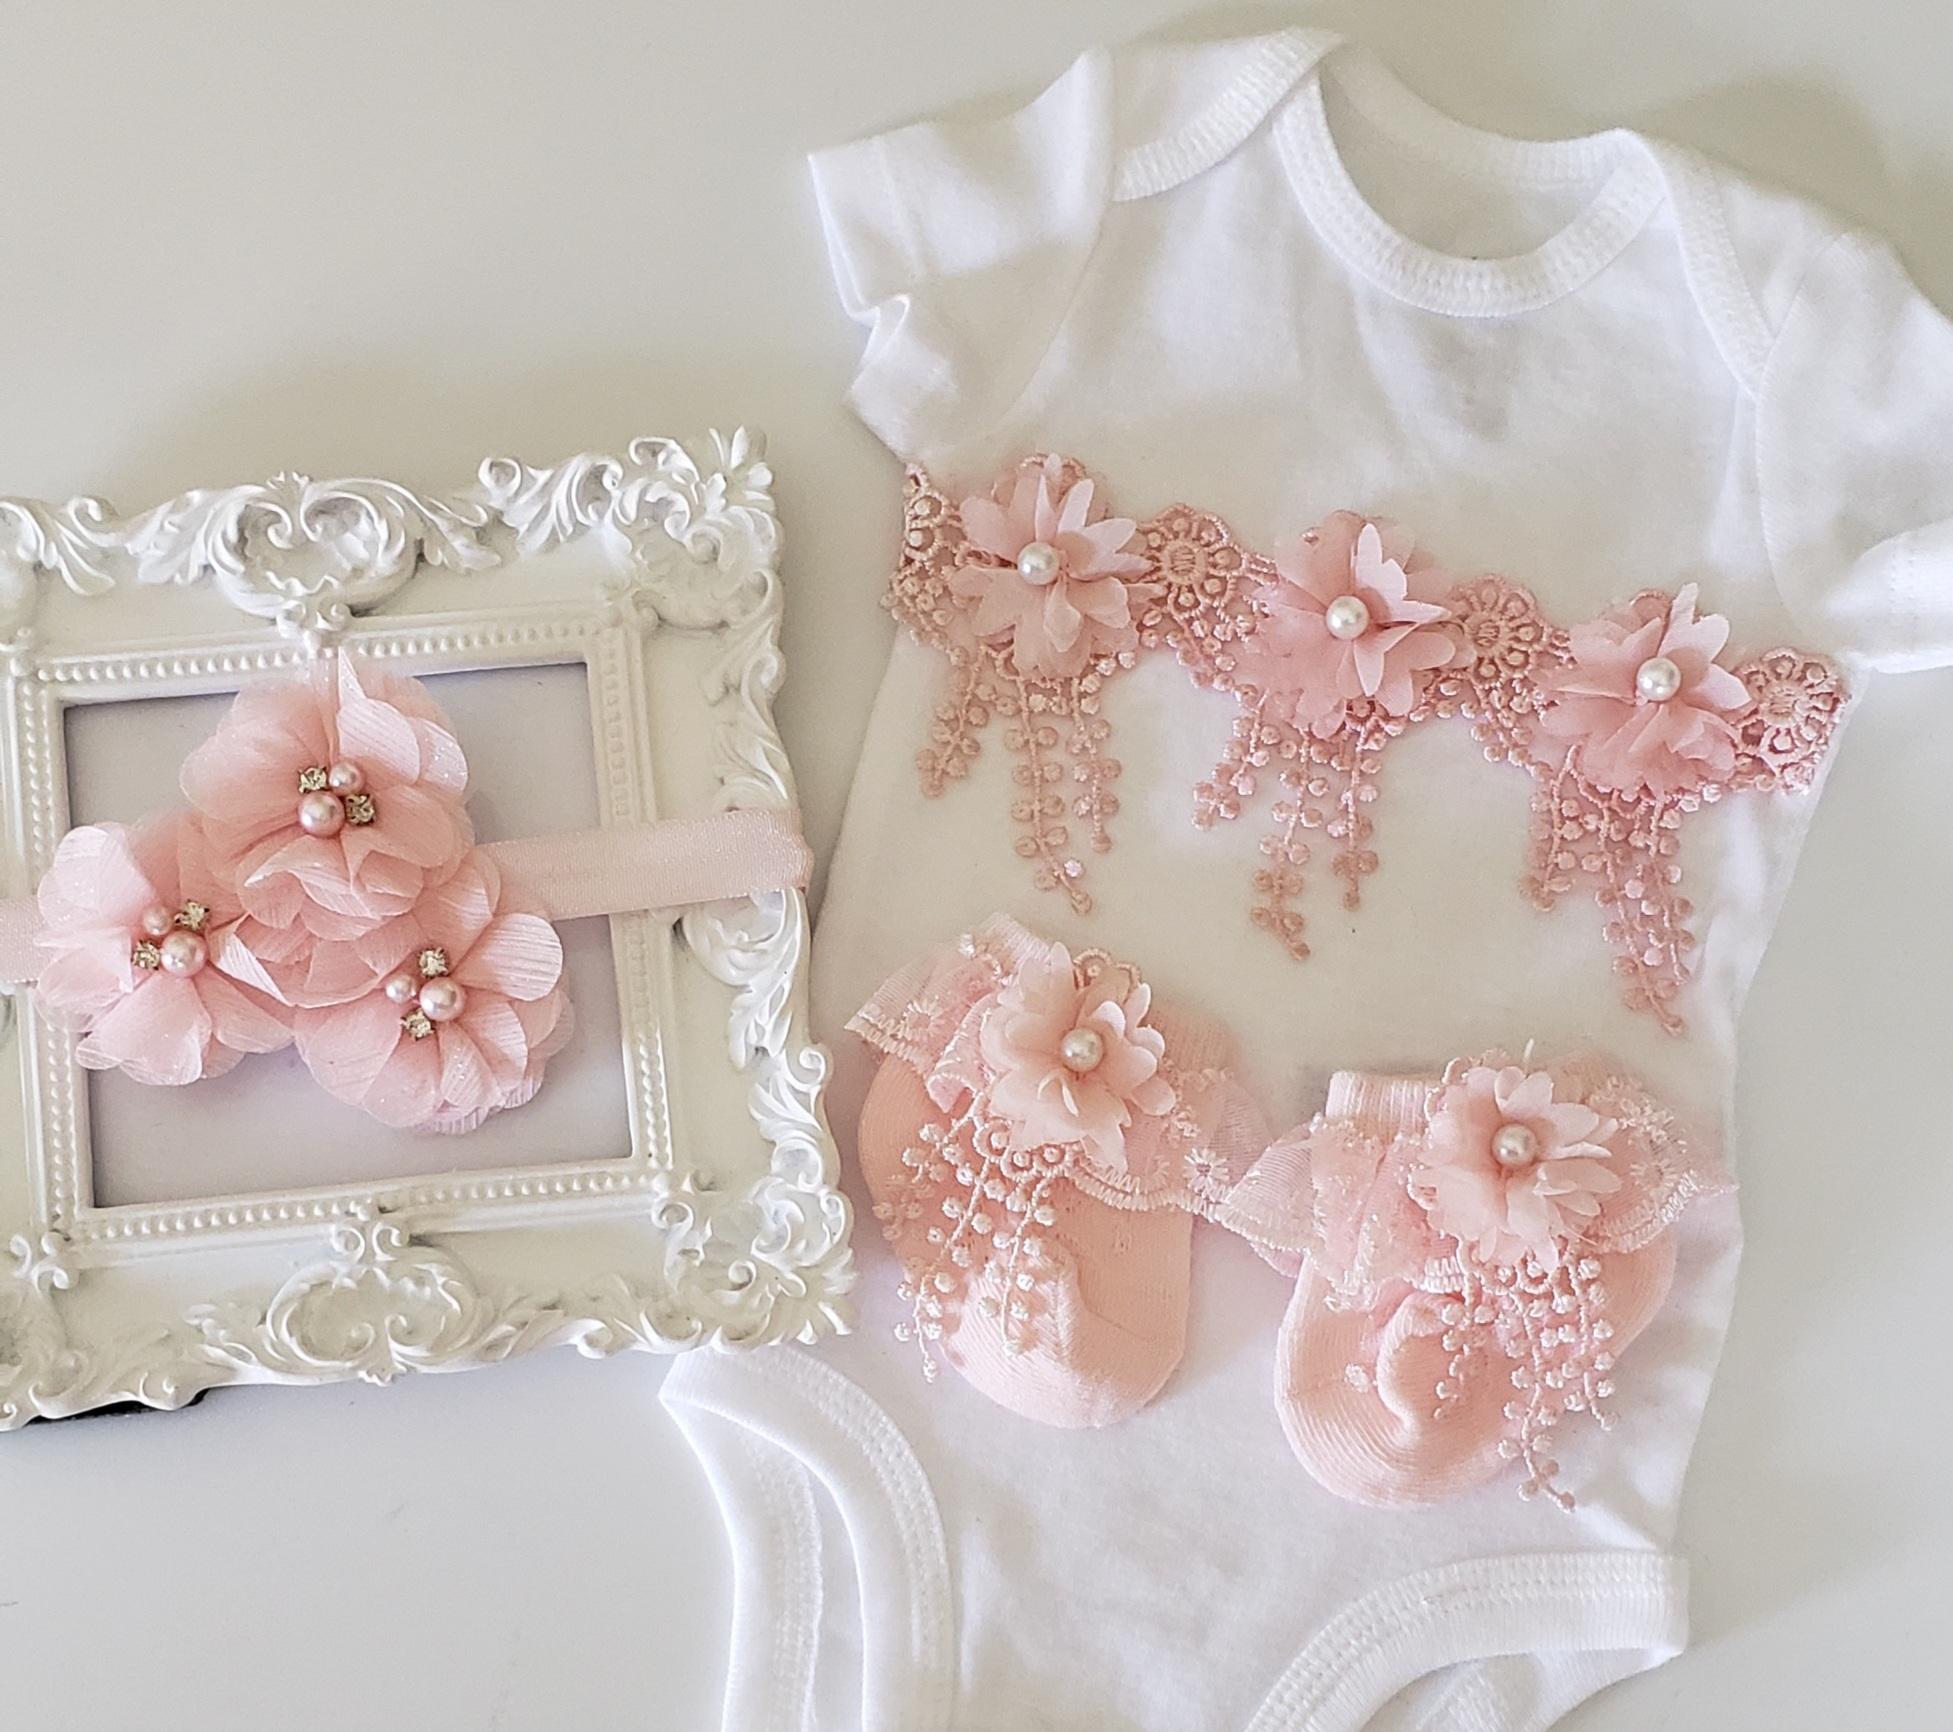 onesie-set-pink-lace-ss-pic-1.jpg